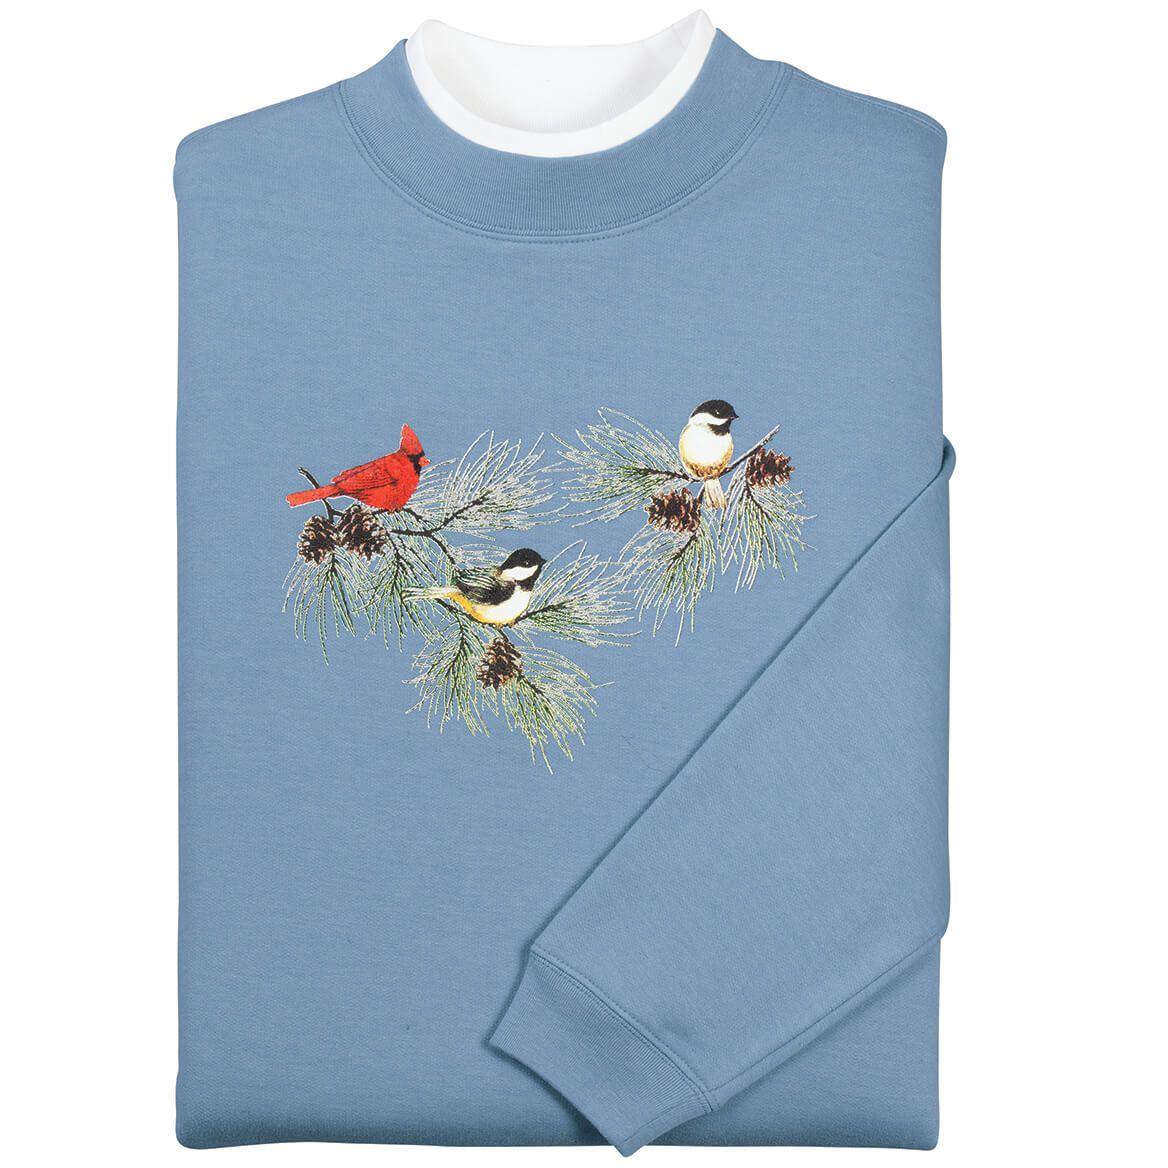 Chickadees and Cardinal Sweatshirt by Sawyer Creek-348968